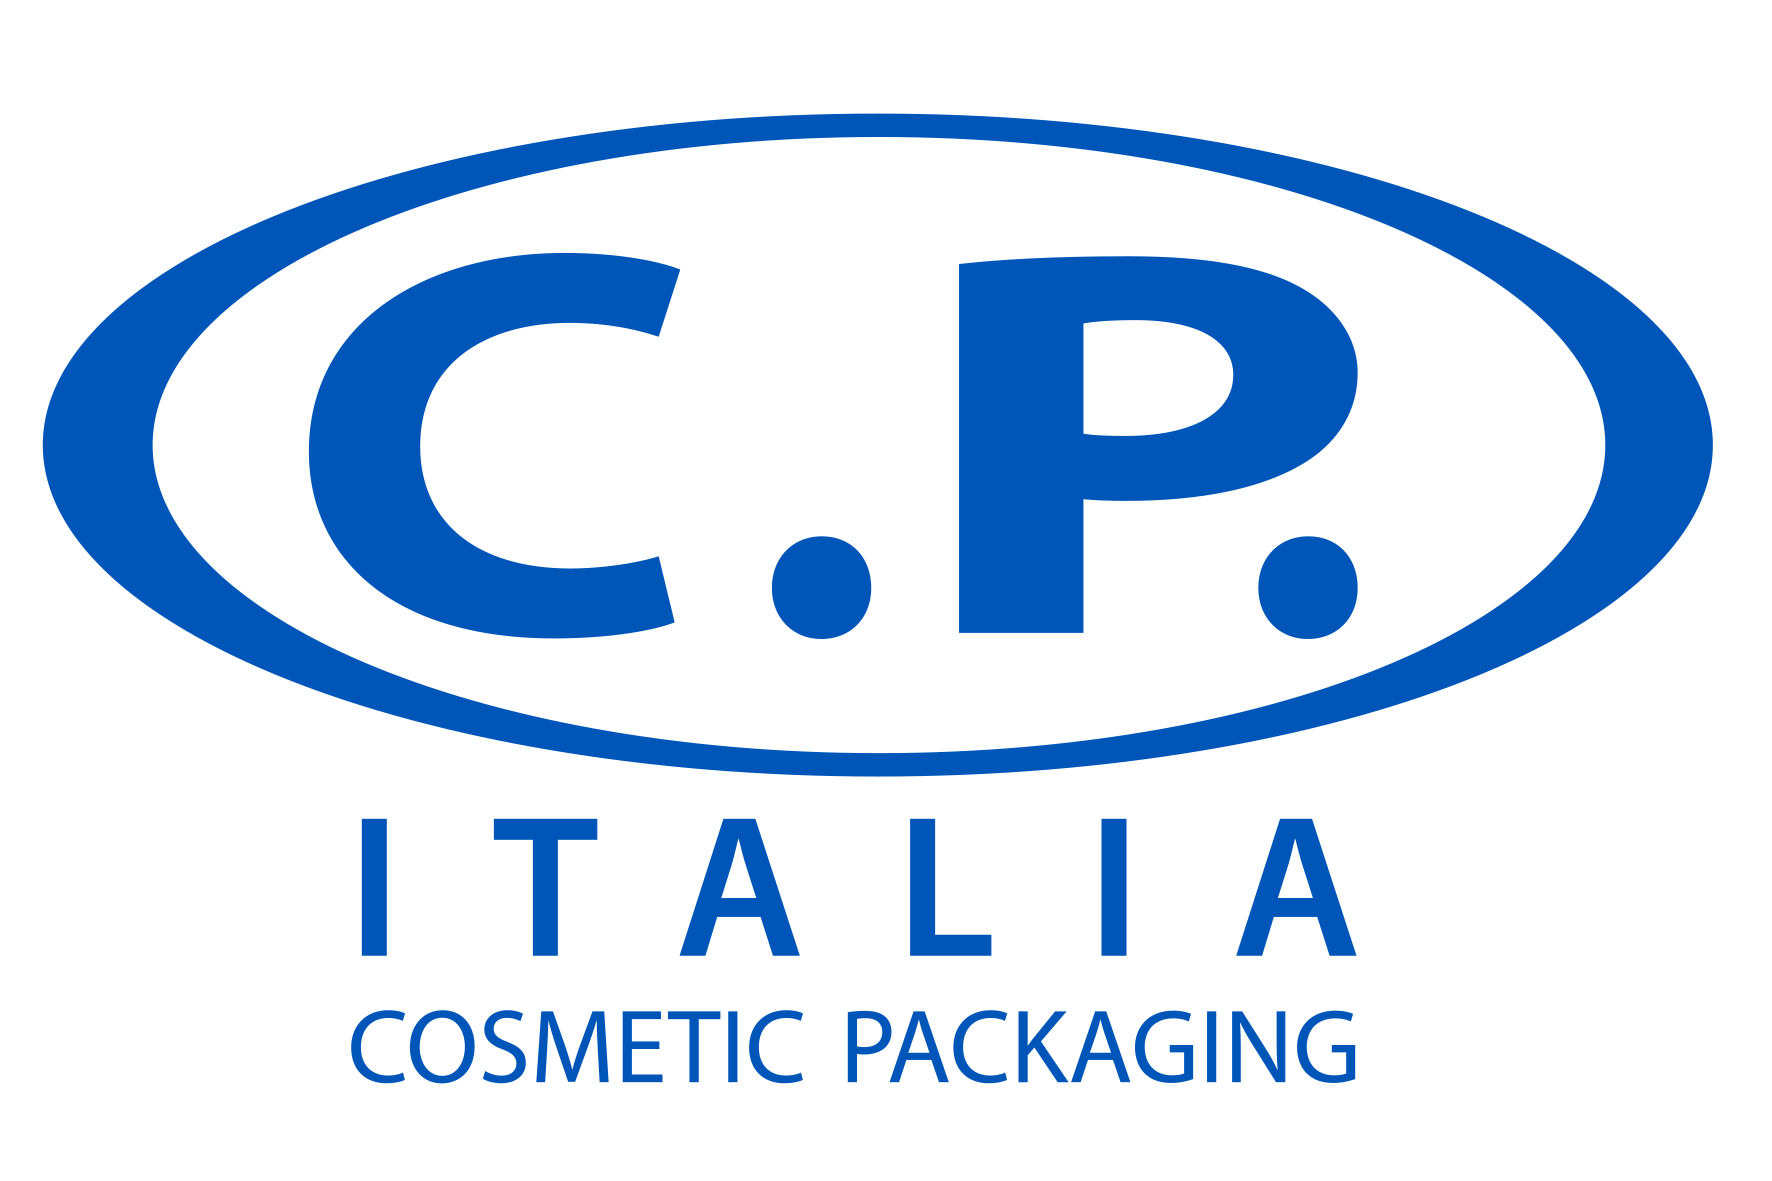 CP Italia